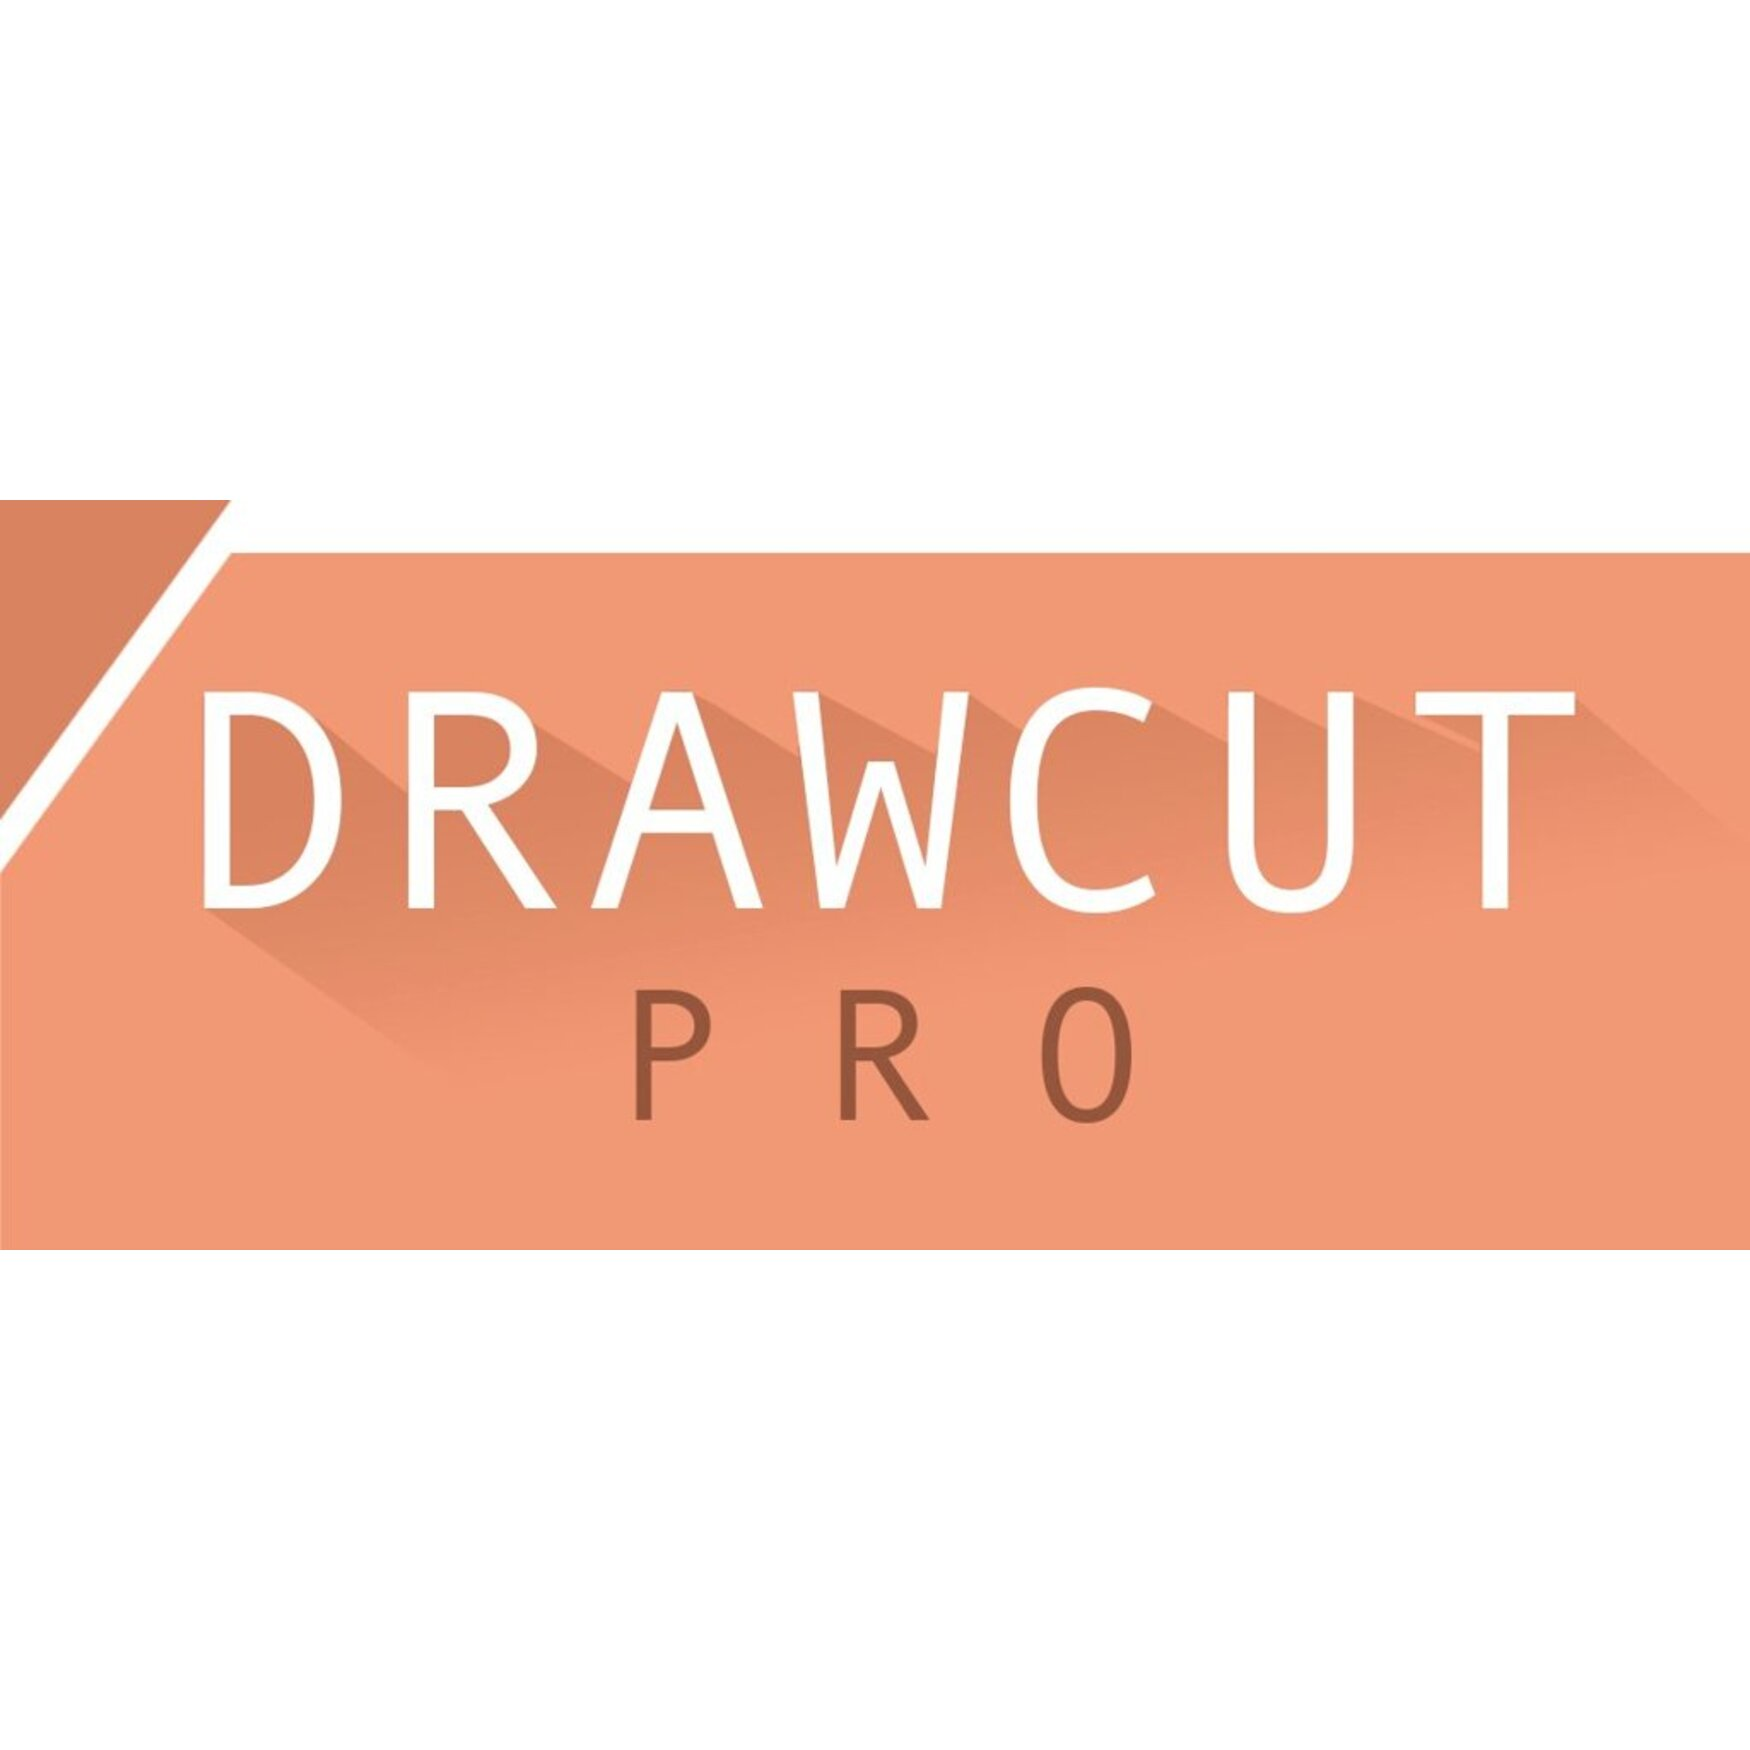 Upgrade DrawCut LITE to DrawCut PRO